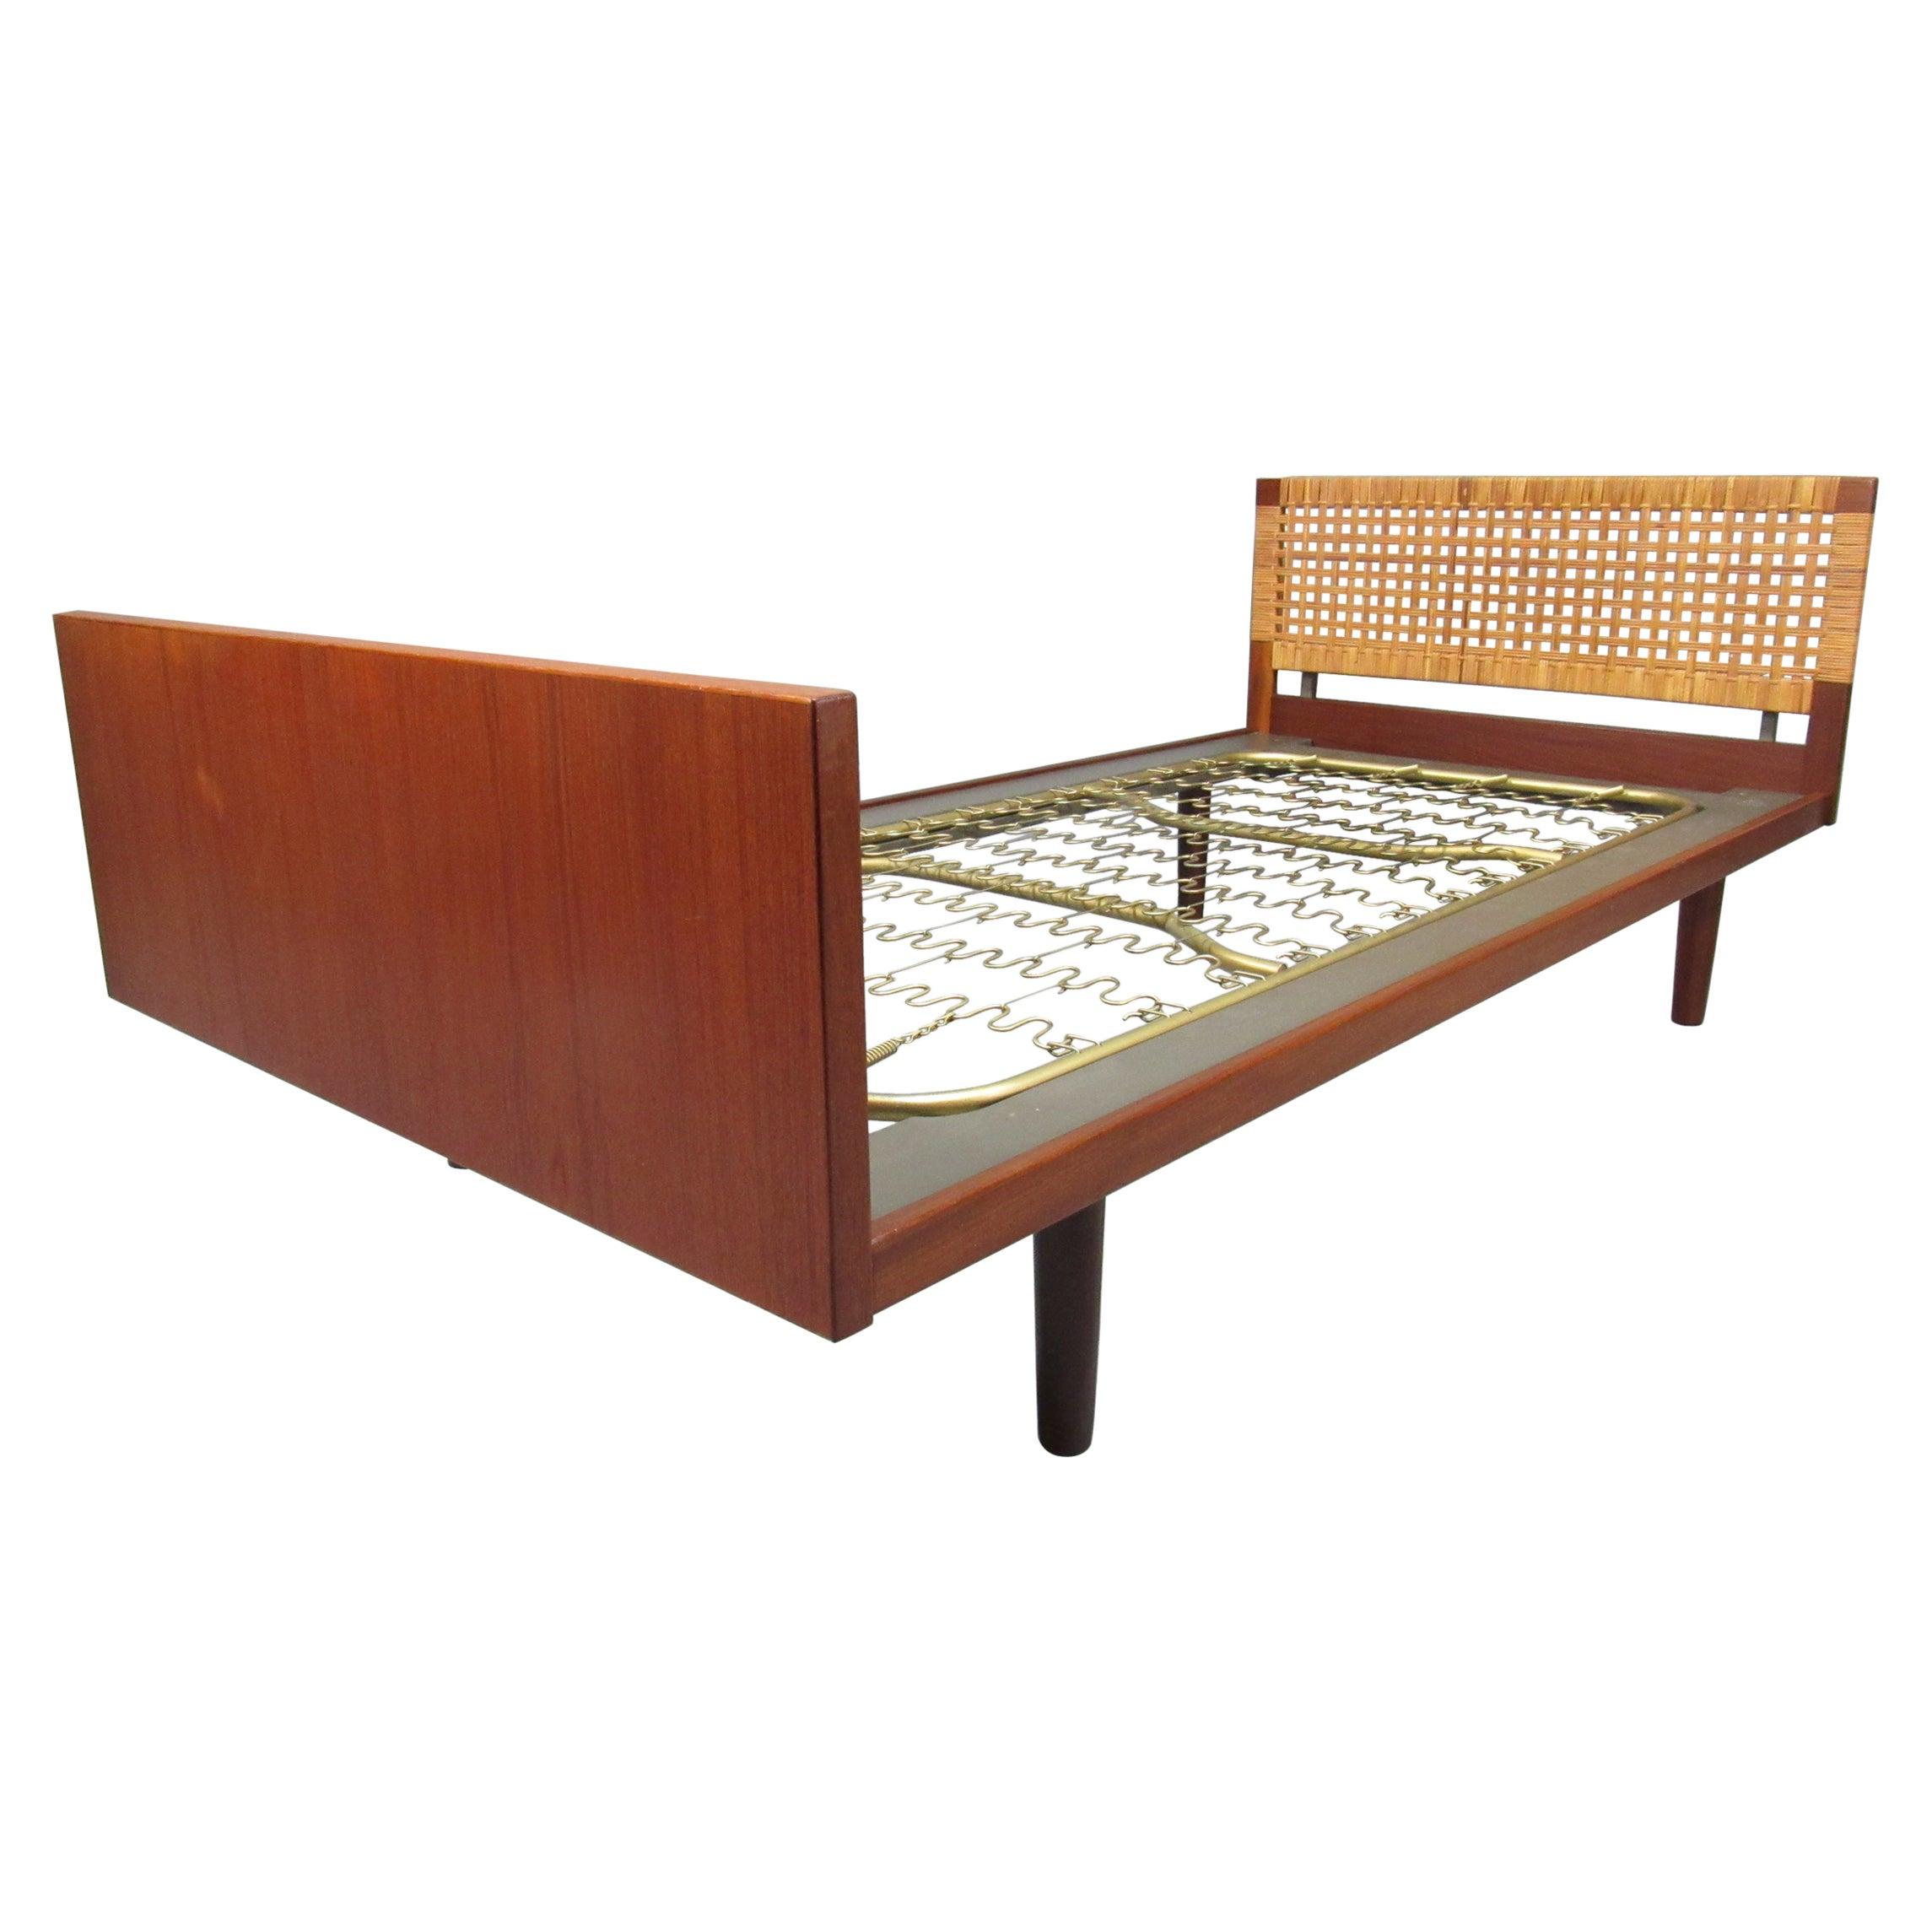 Midcentury 1960s Danish Modern Teak and Cane Bed by Hans Wegner for GETAMA